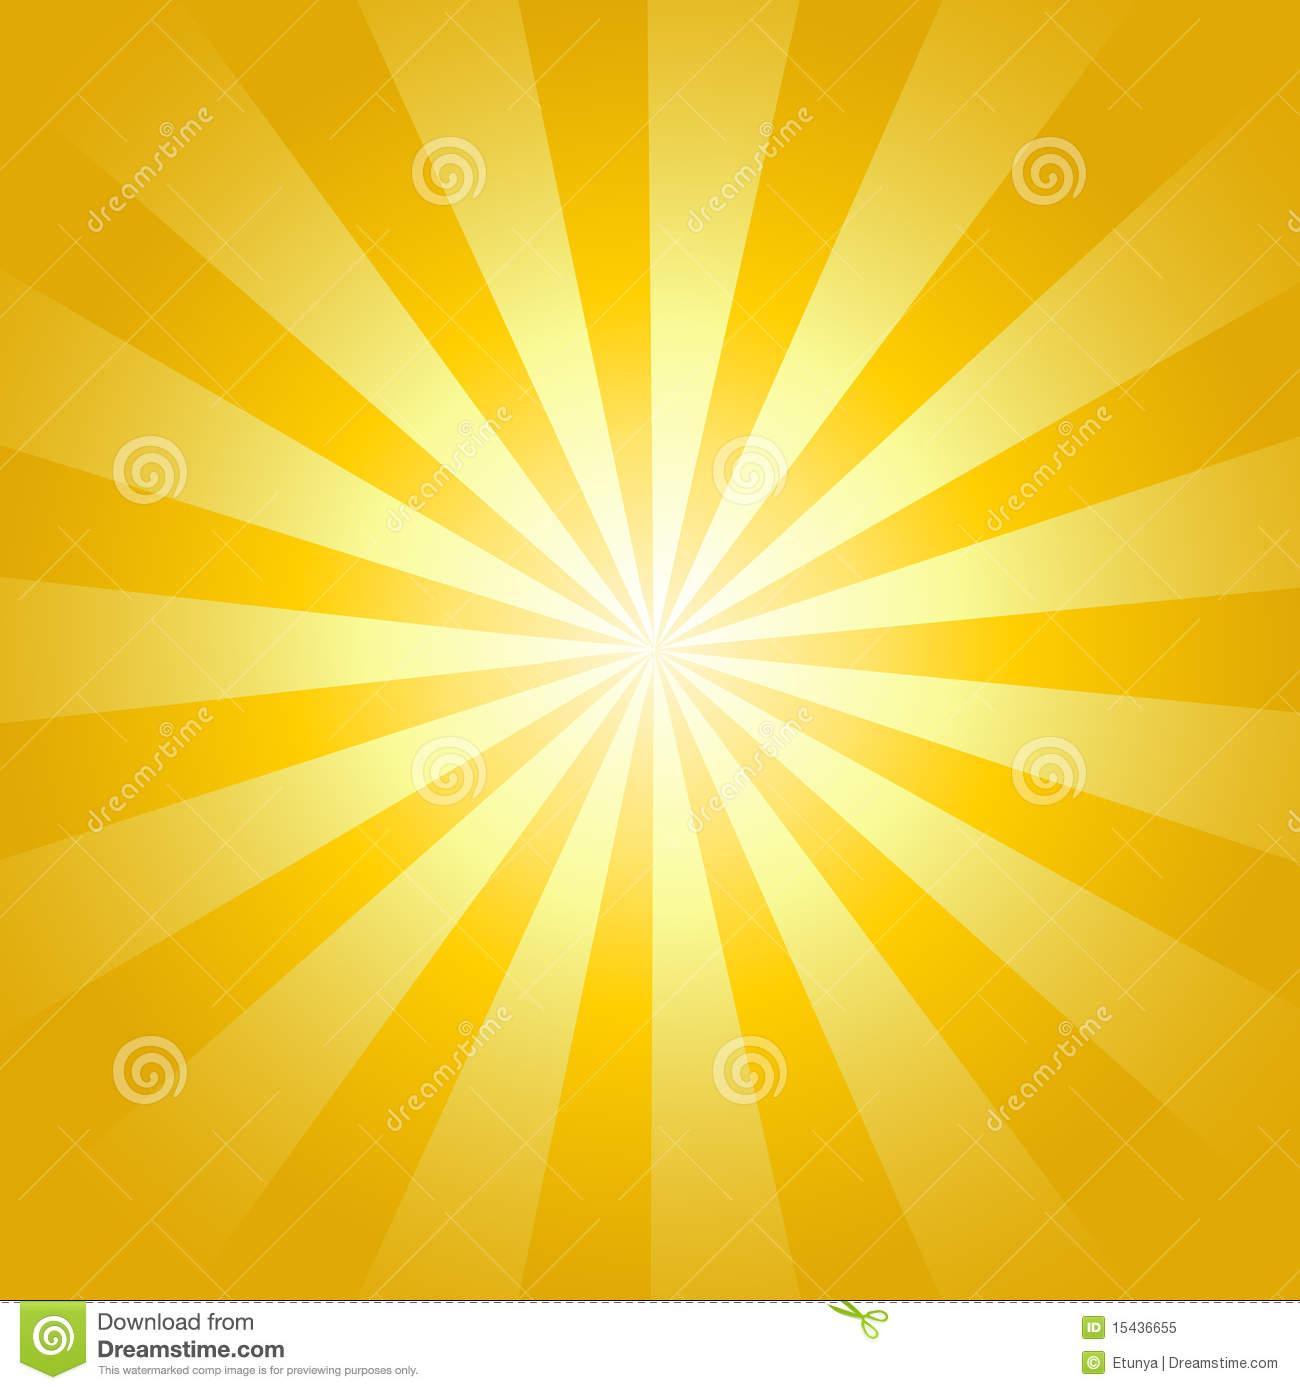 Yellow clipart sunrise Sunrise Wallpaper Wallpaper Download Sunrise